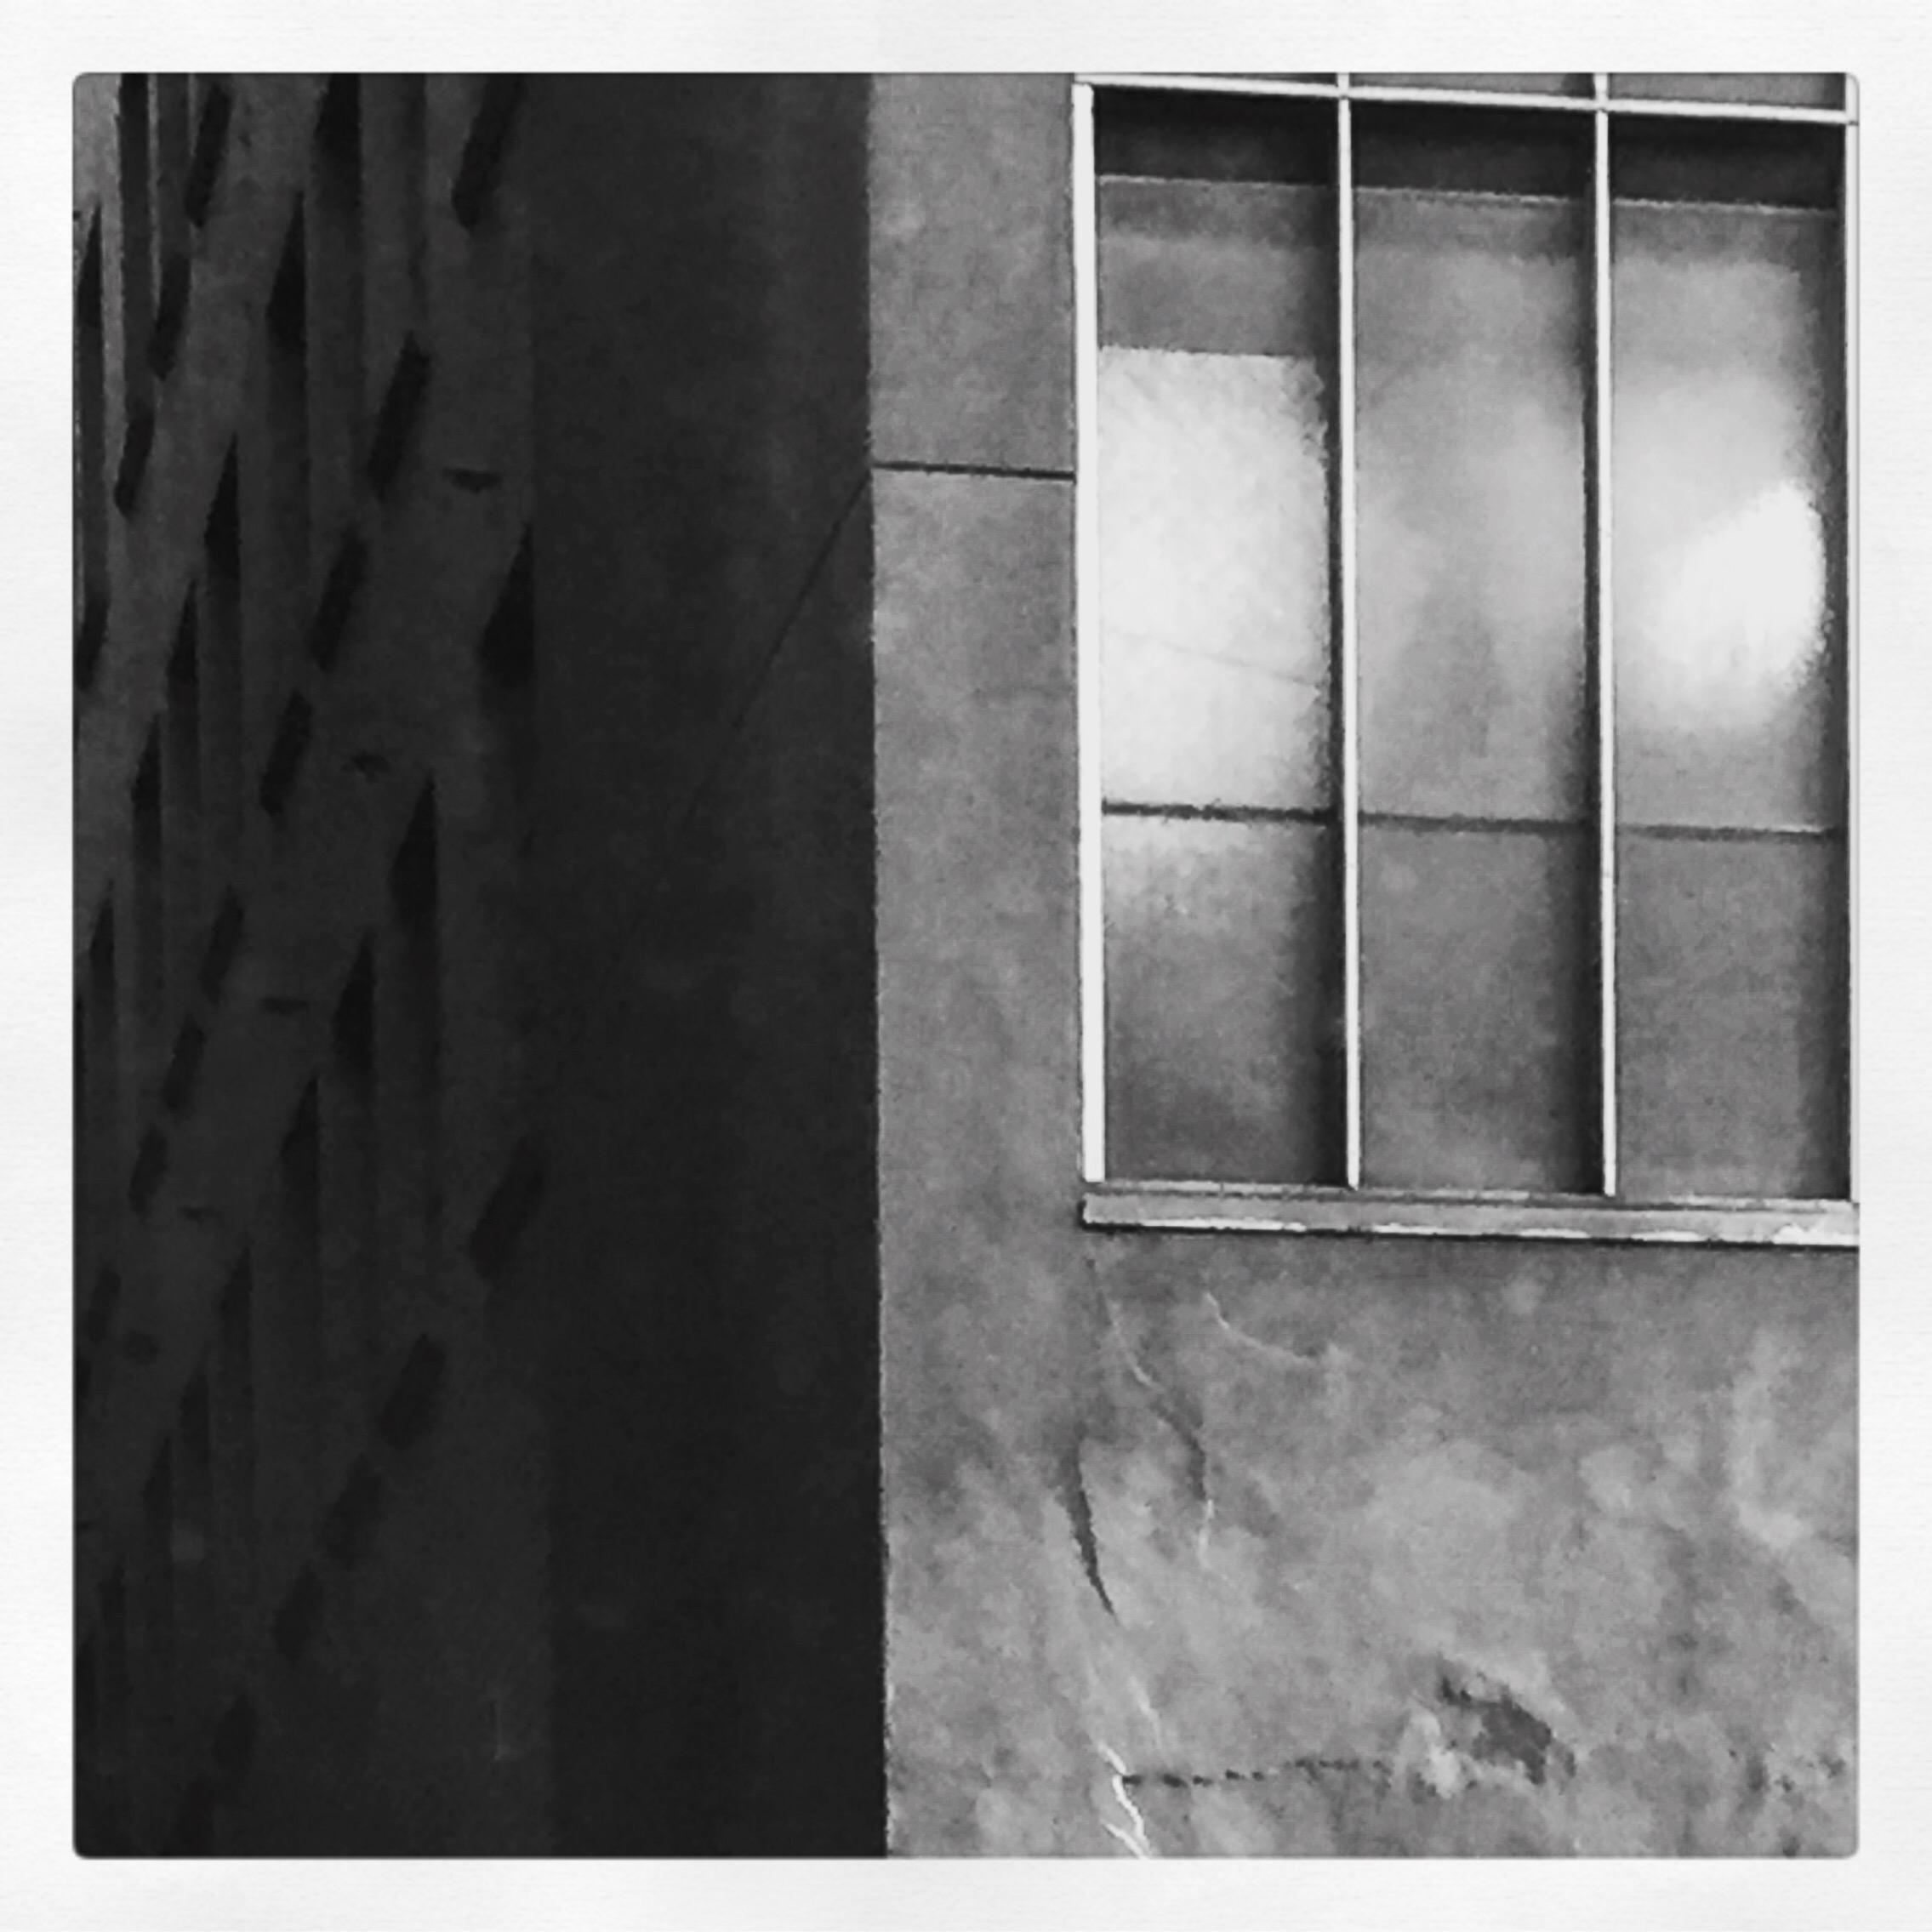 Day 1709. prisoned…